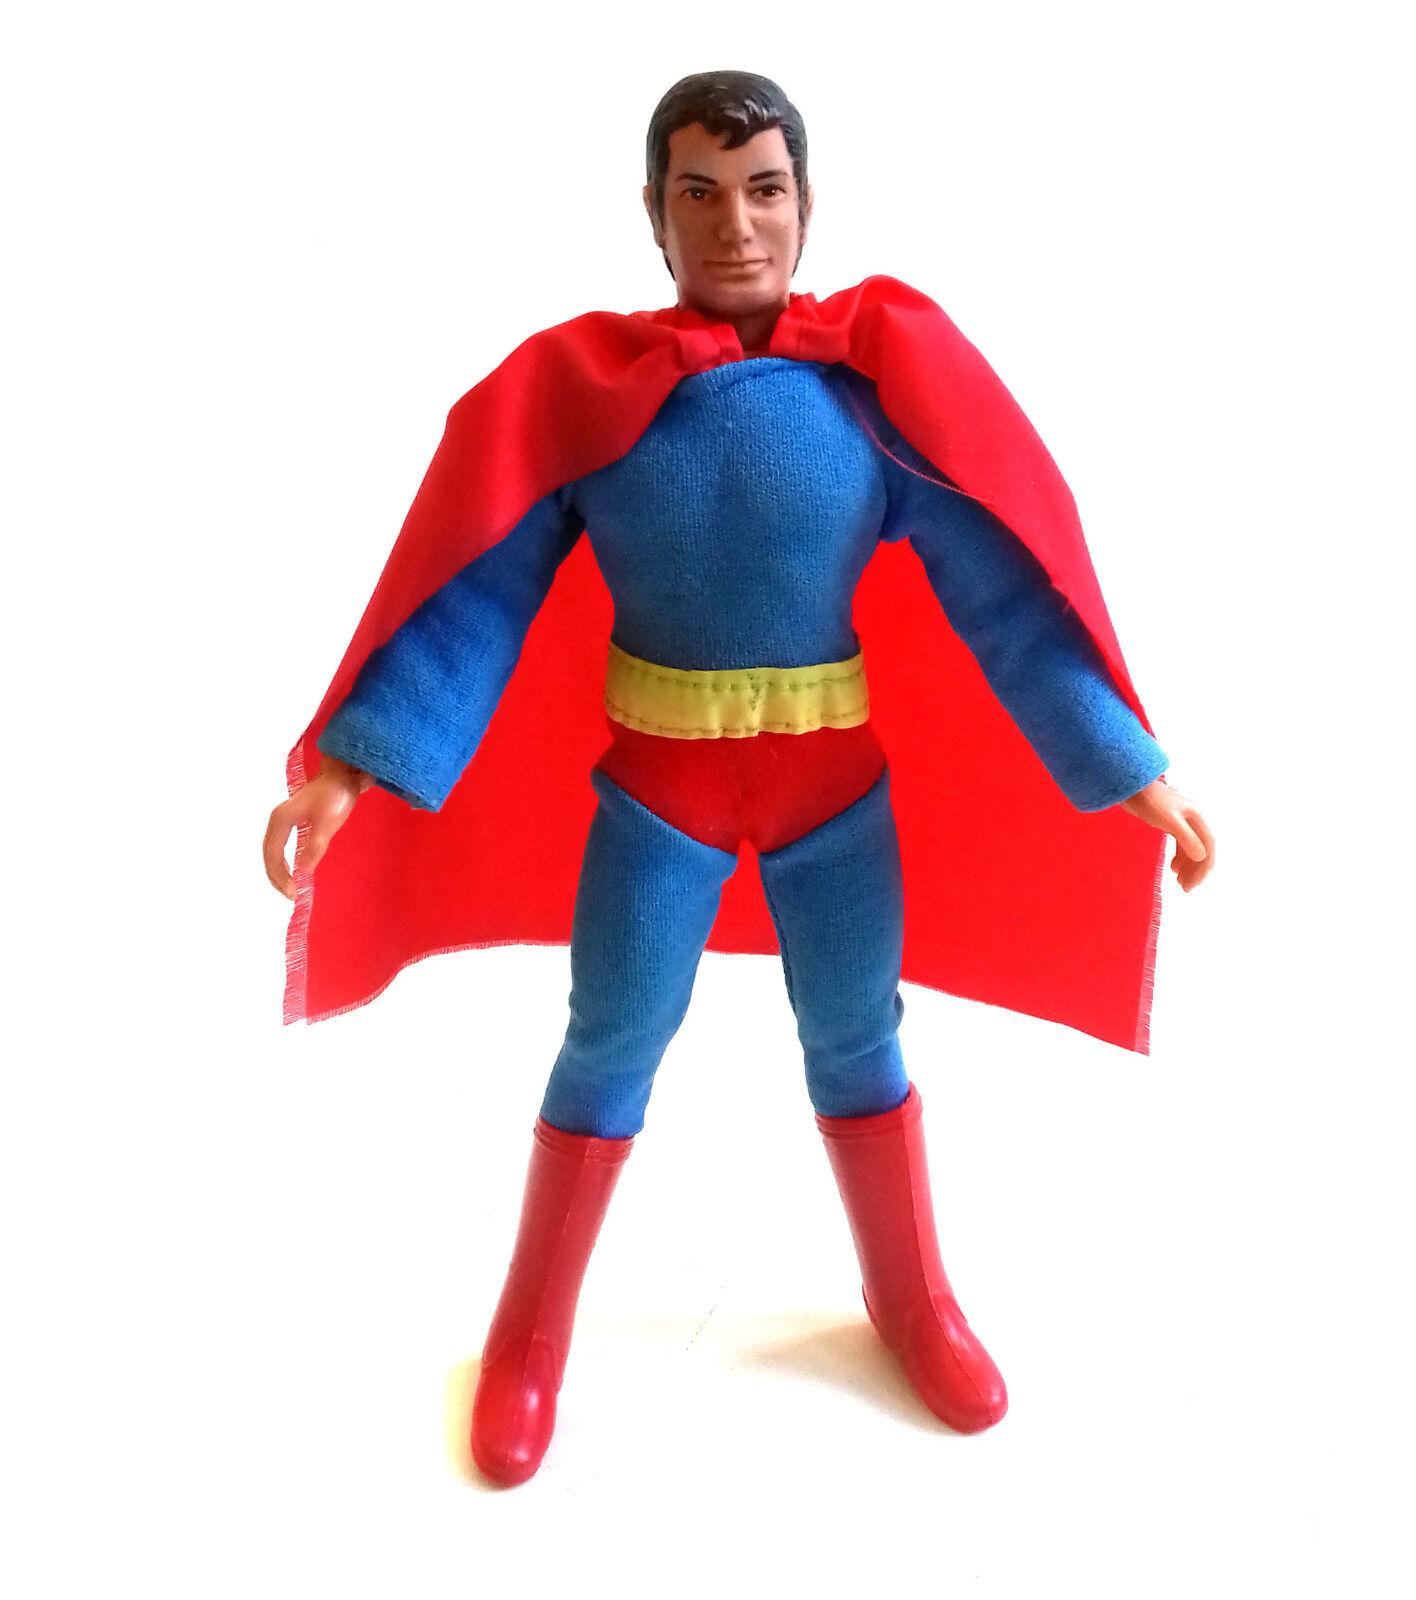 DC Comics Vintage Mego Juguetes Superman Superhéroe 8  Figura De Acción Marvel 1970s